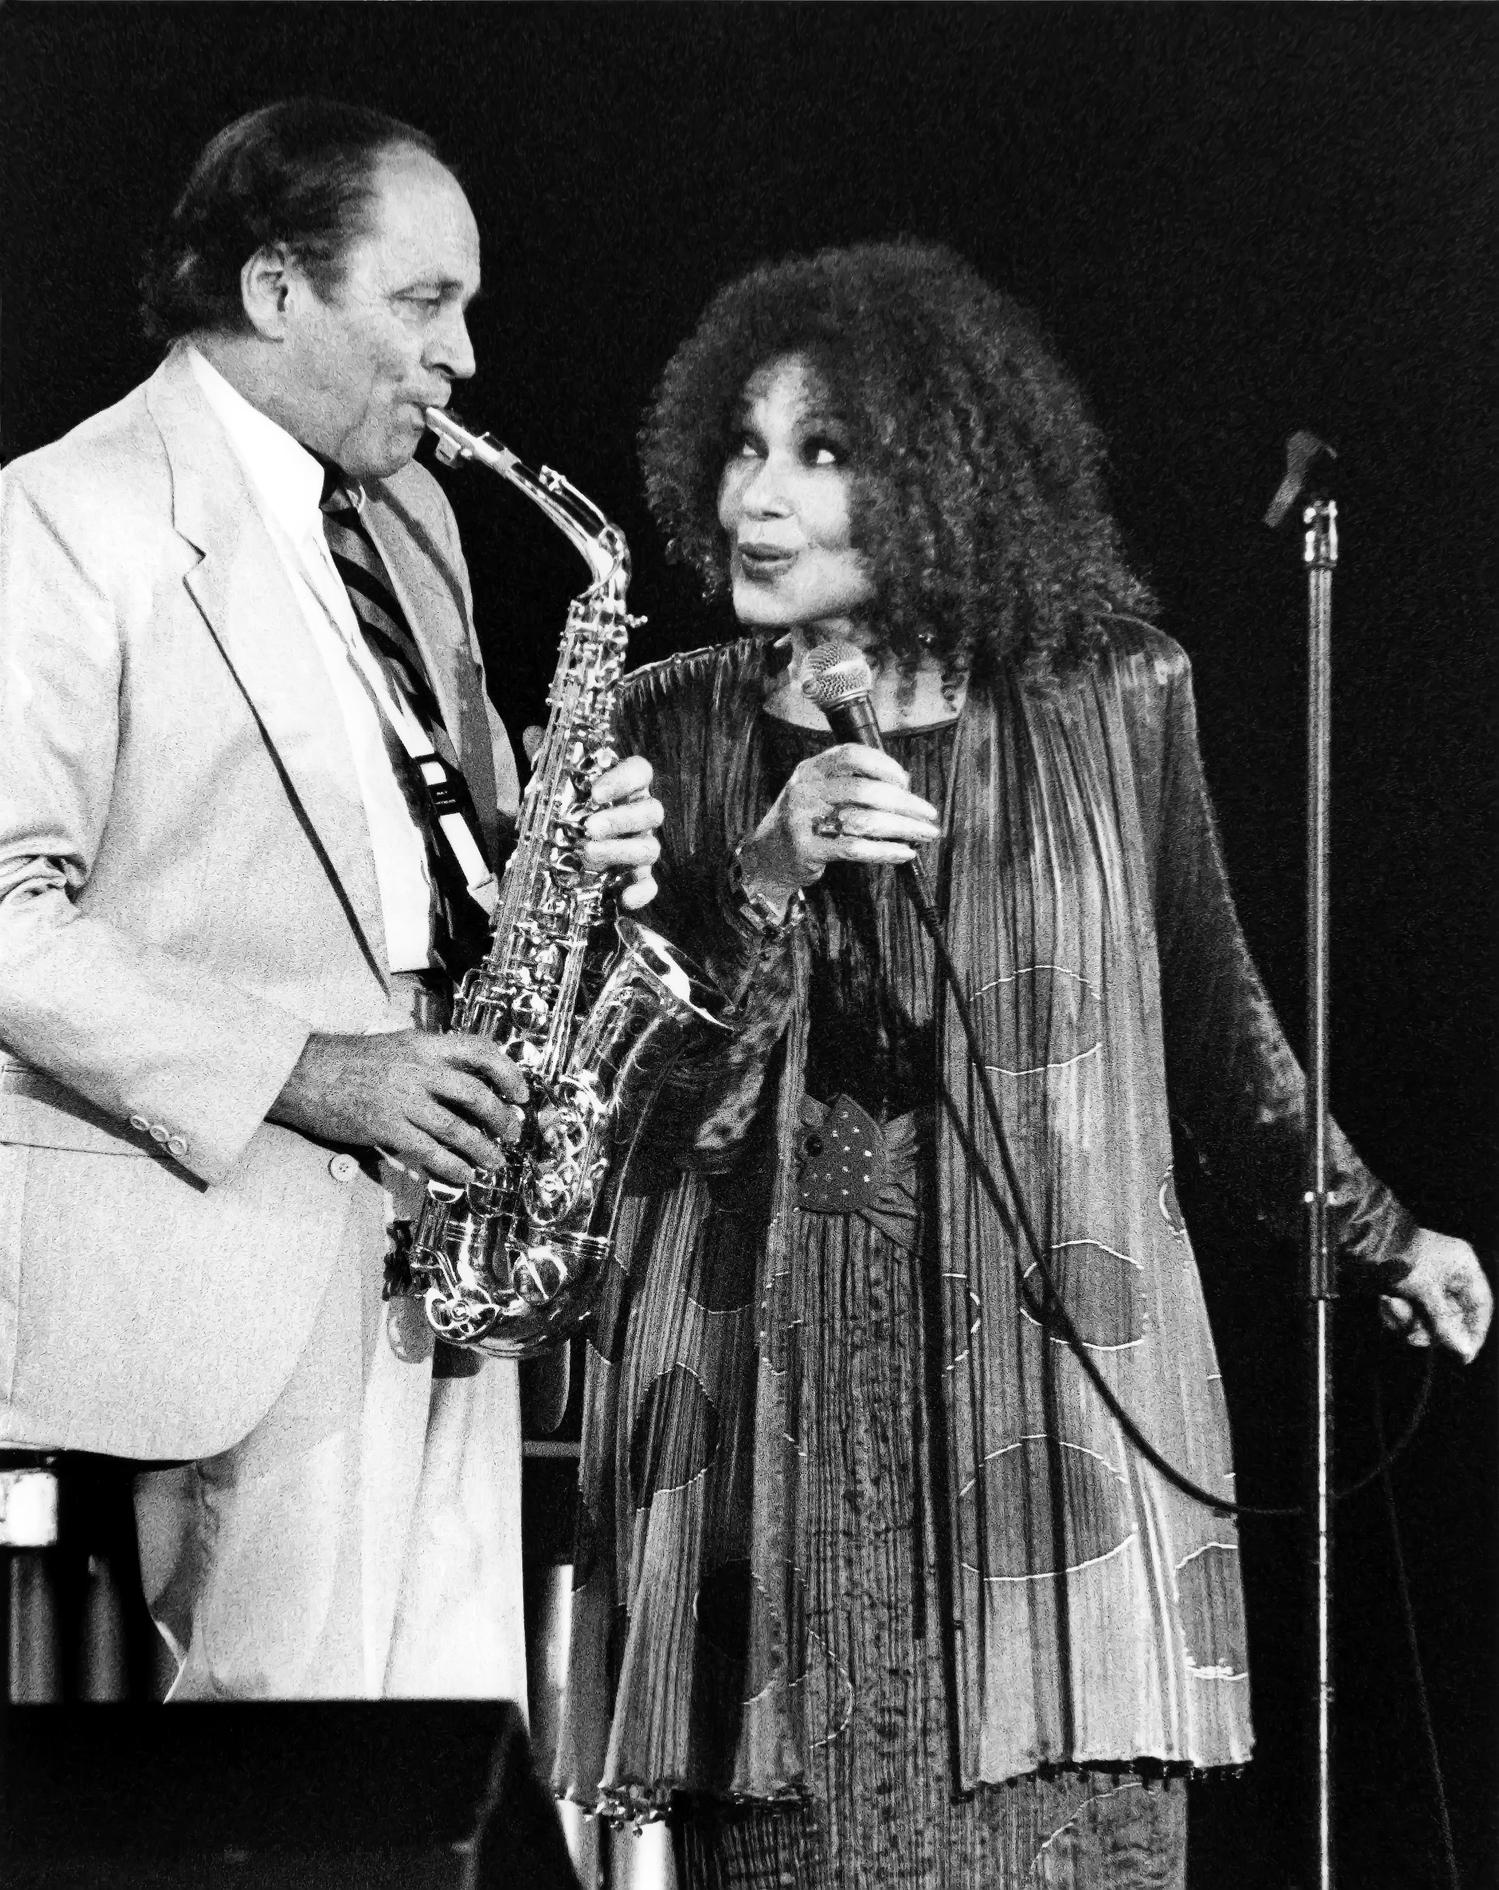 John Dankworth & Cleo Laine